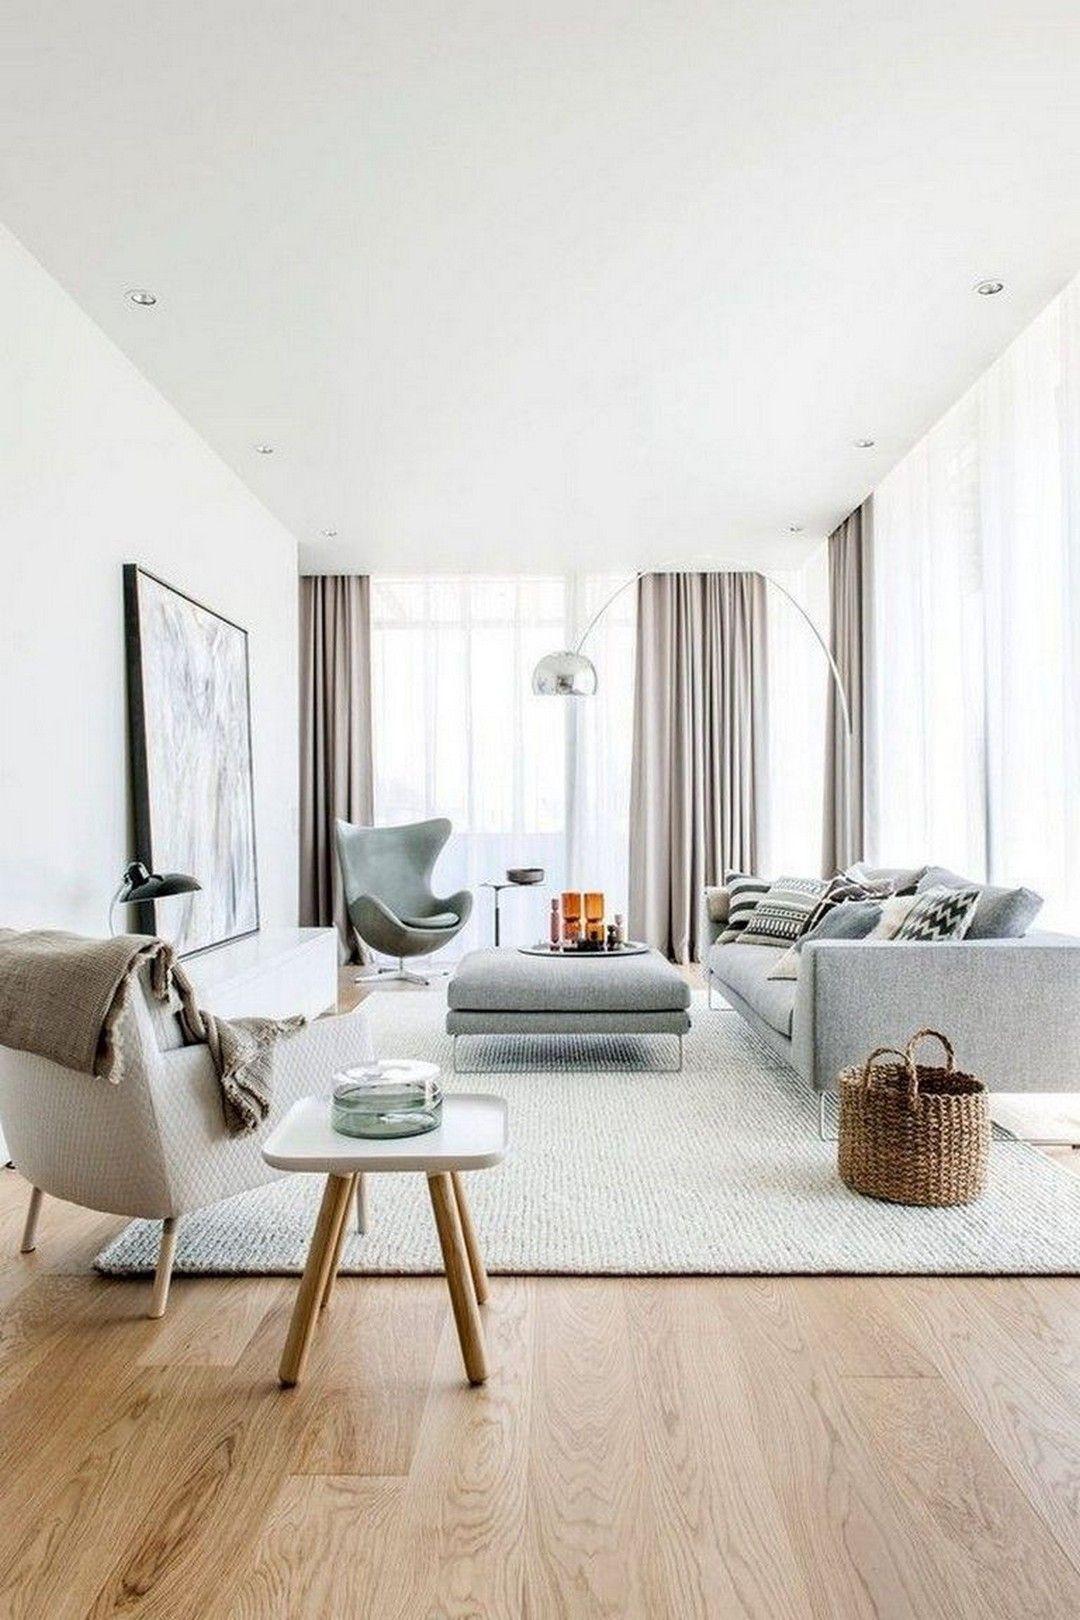 52 Fabulous Scandinavian Interior Design Ideas